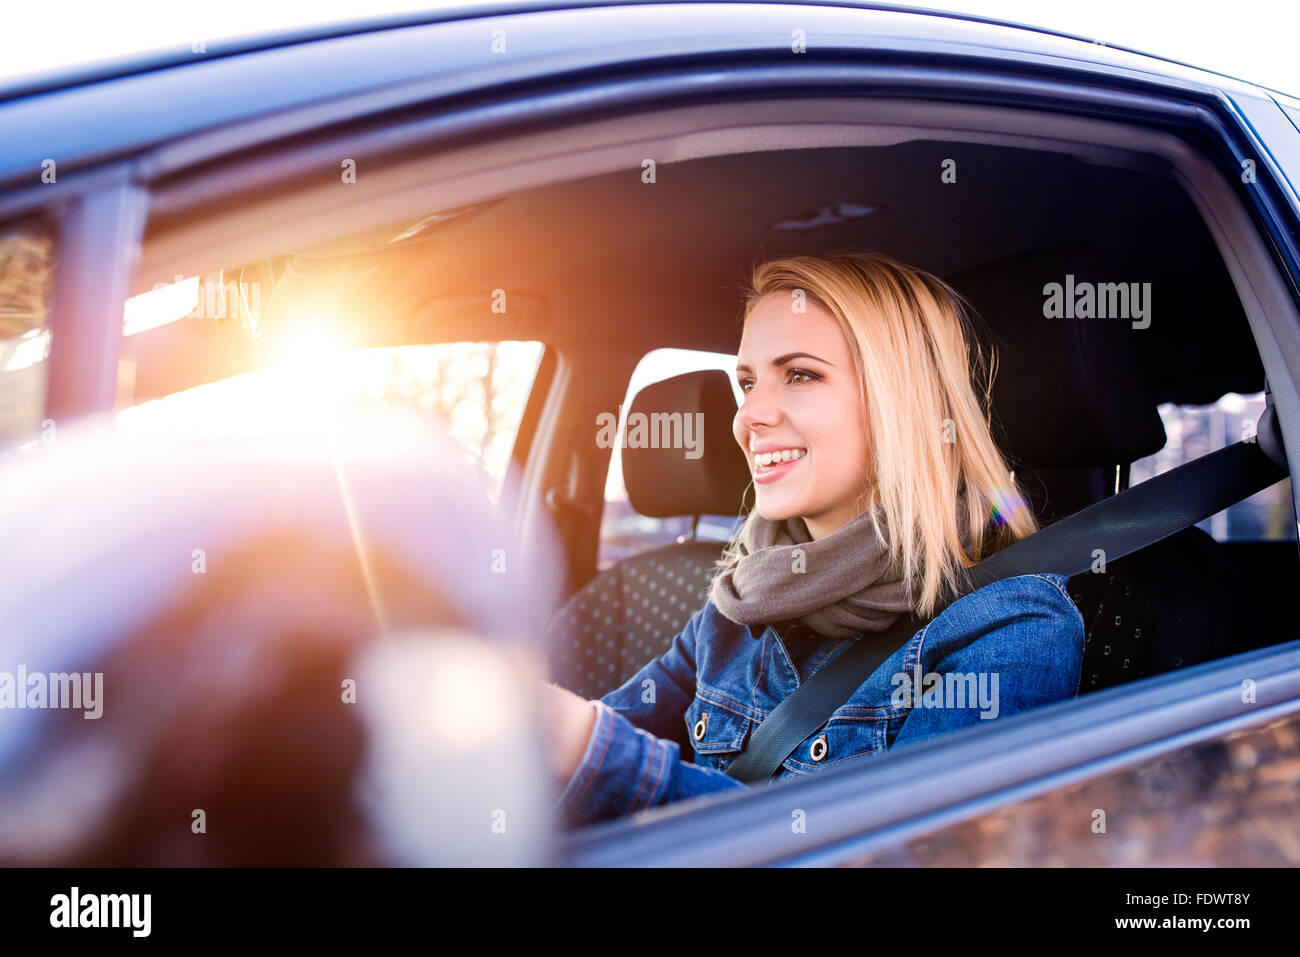 Mujer conduciendo un coche Imagen De Stock